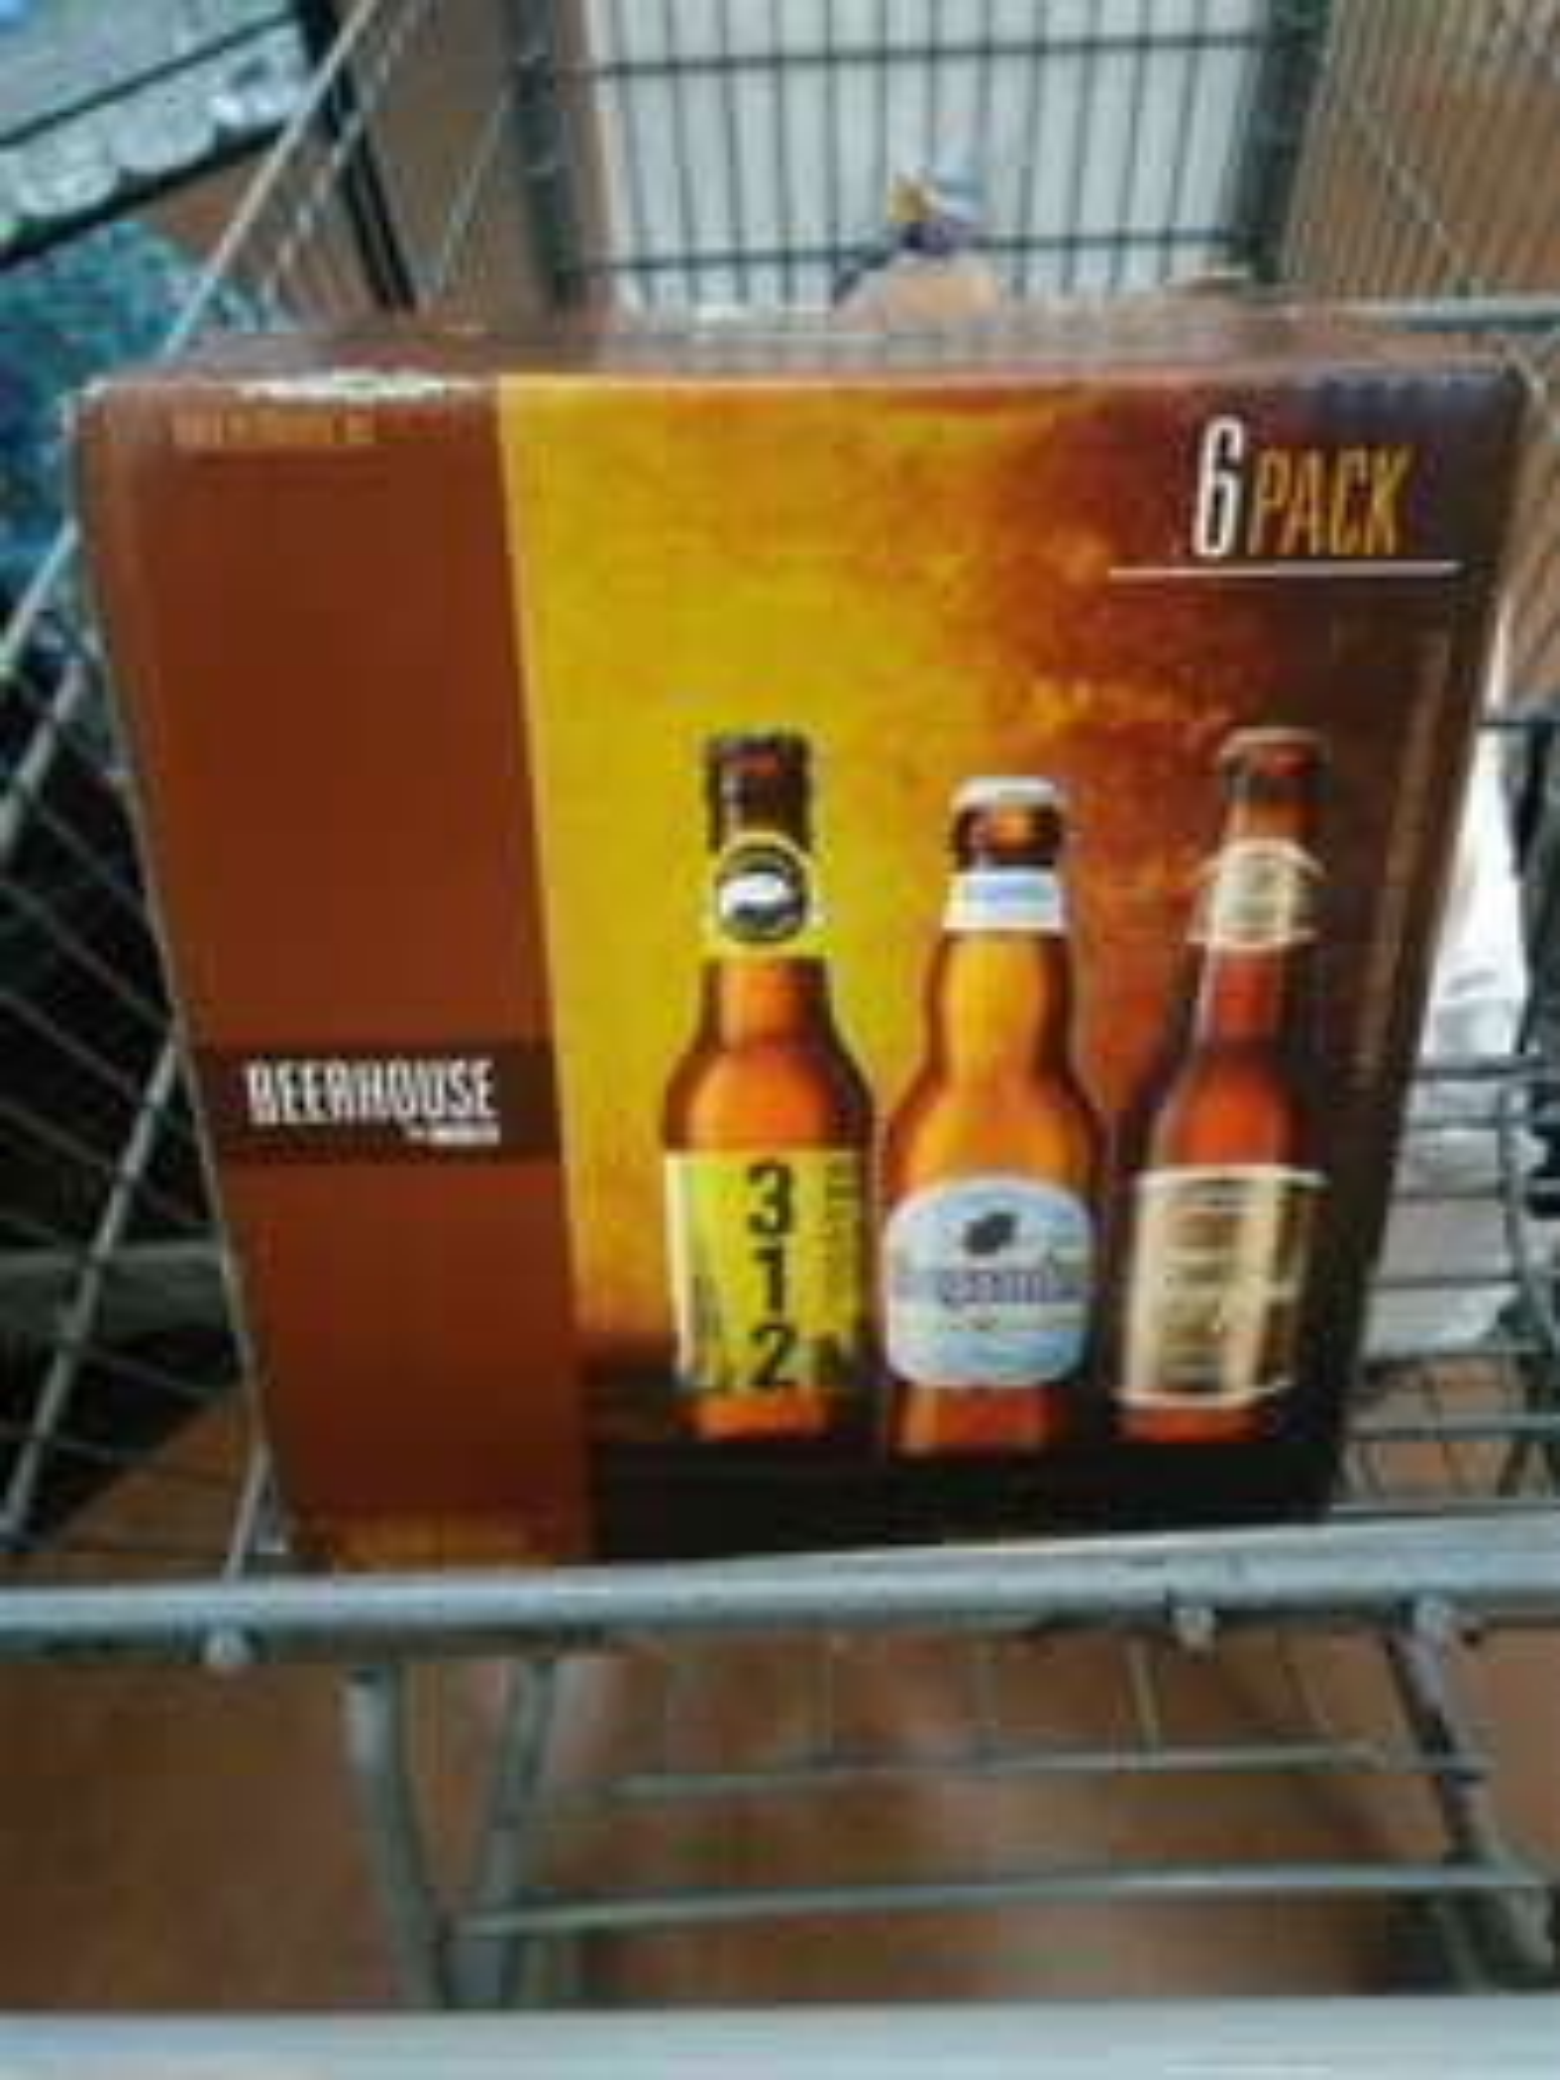 Walmart Periférico Cuautitlán: 6 Pack Cerveza Beerhouse